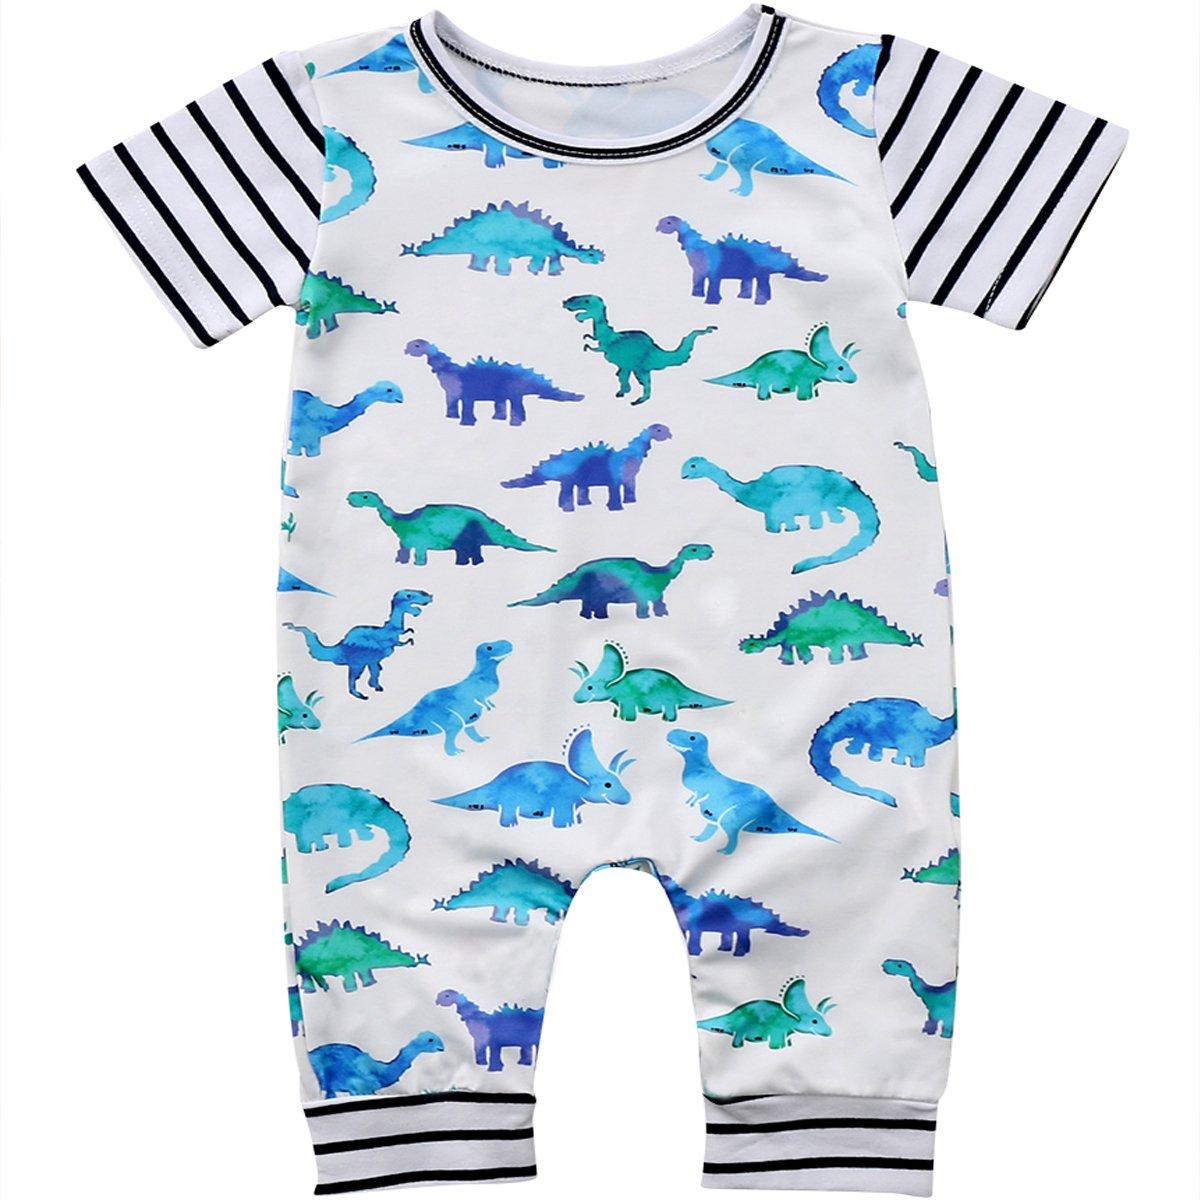 Annvivi Newborn Baby Boys Dinosaur Striped Romper Short Sleeve Bodysuit Outfits